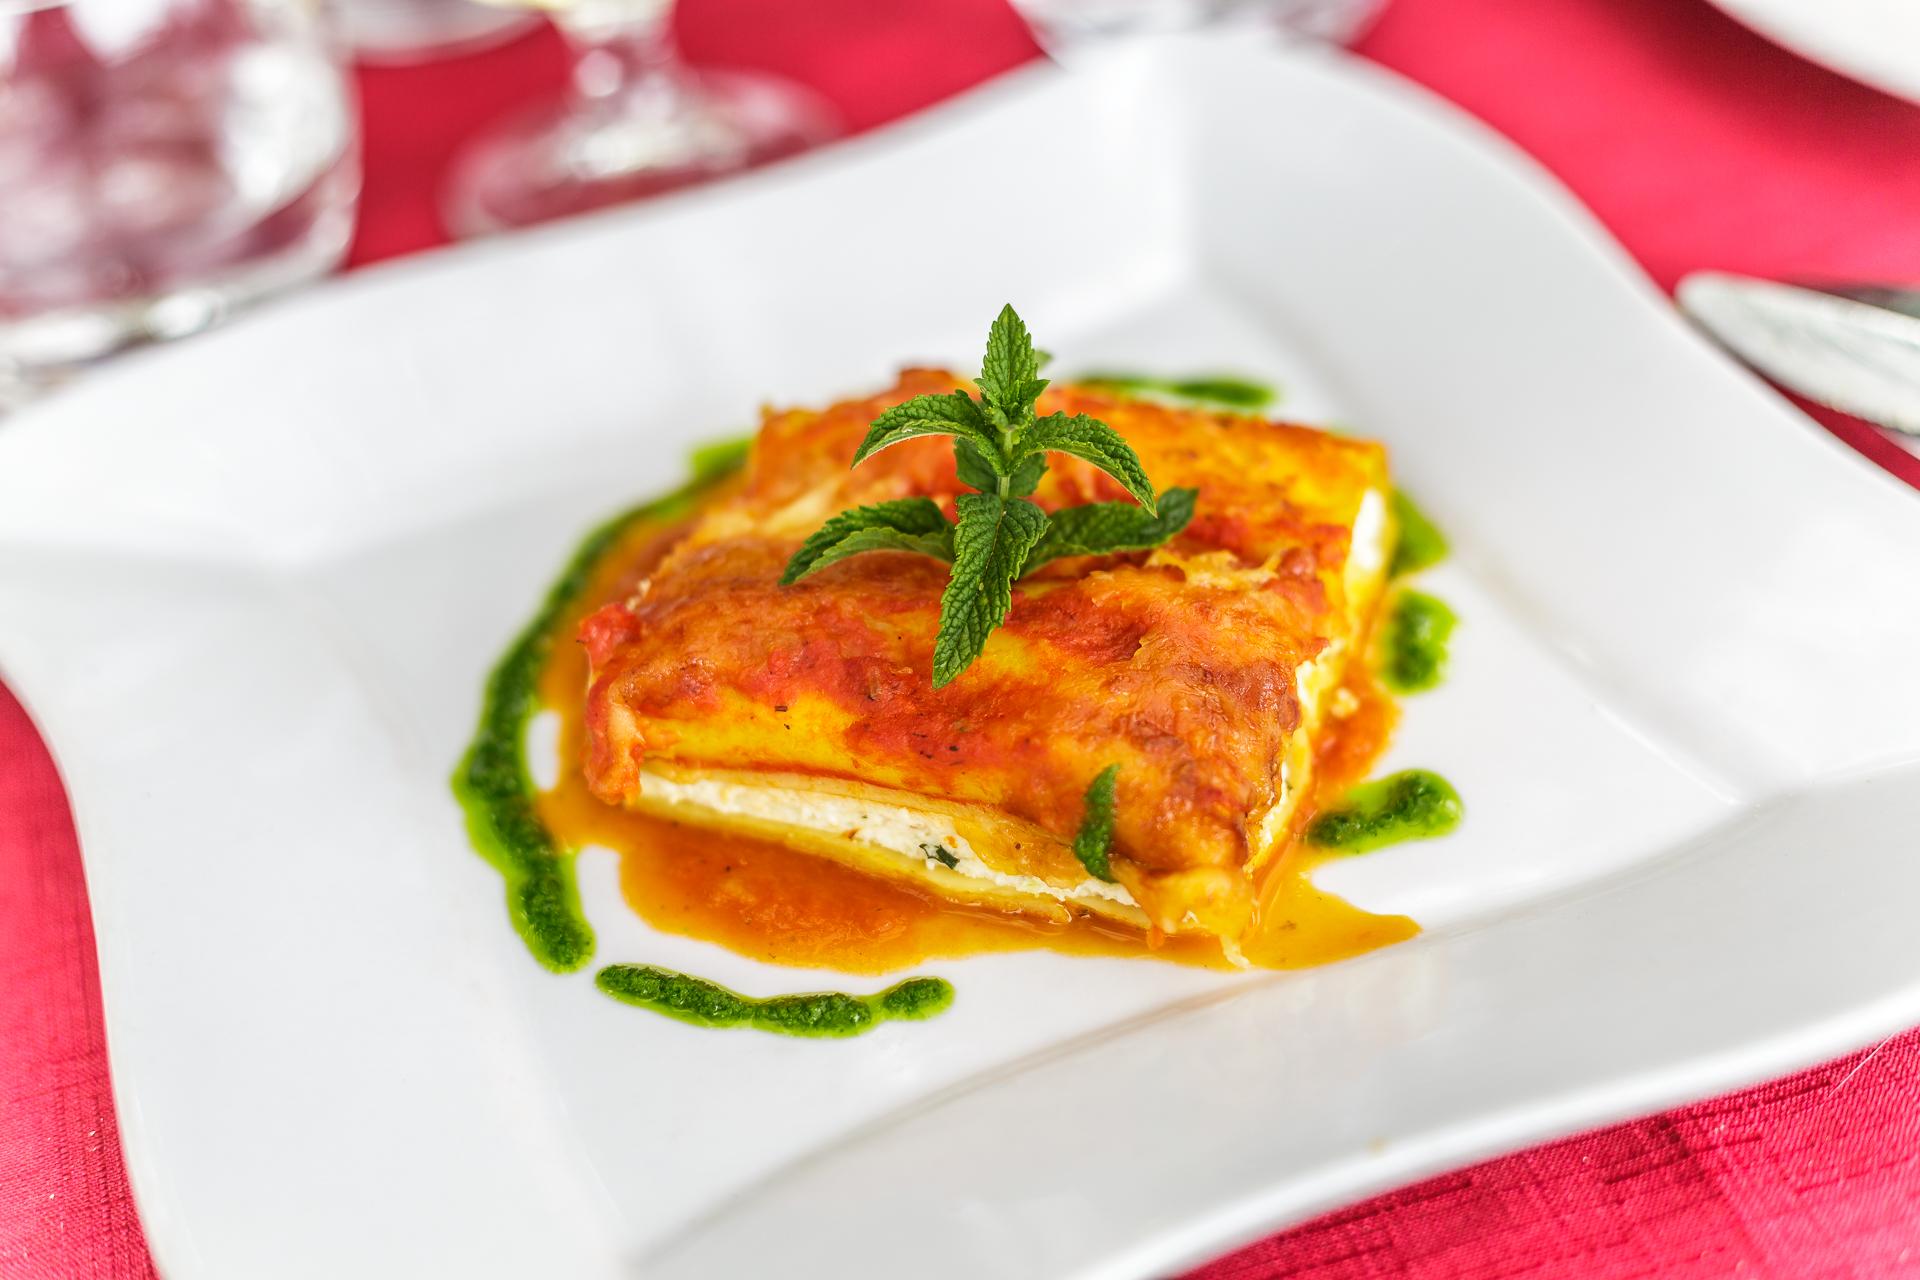 A-Stalla-korsische-cannelloni